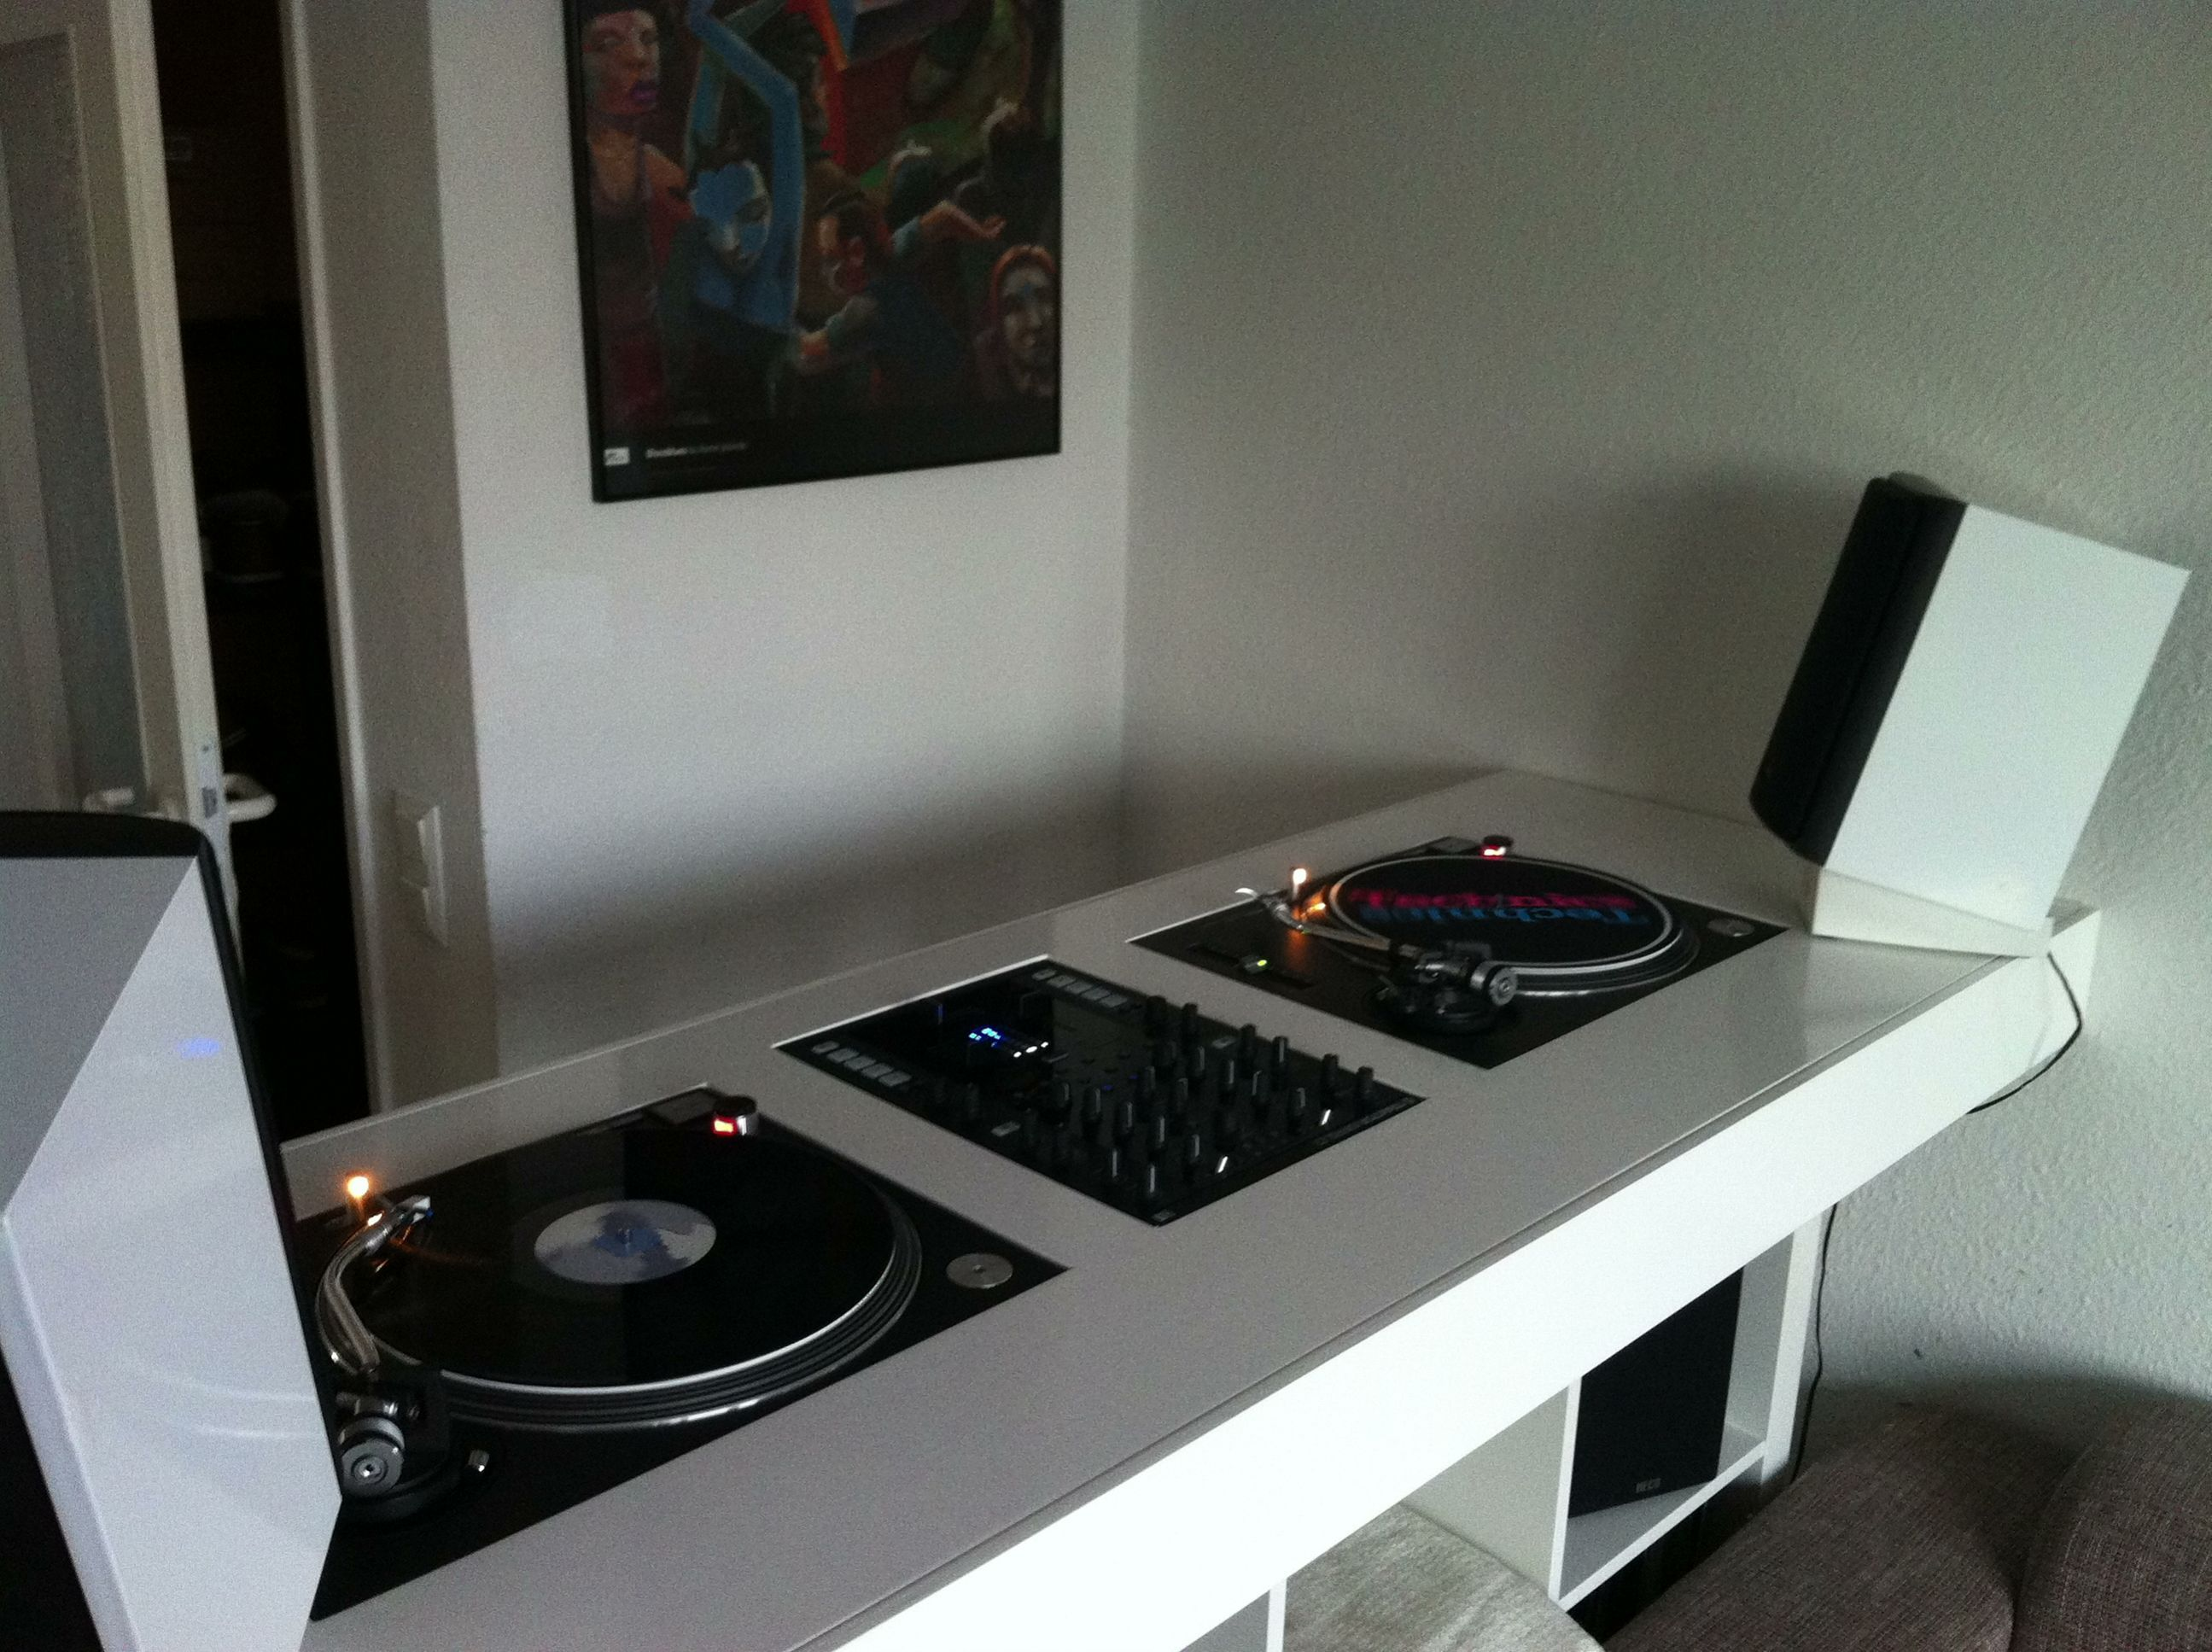 dj setup dj dj booth and dj equipment. Black Bedroom Furniture Sets. Home Design Ideas